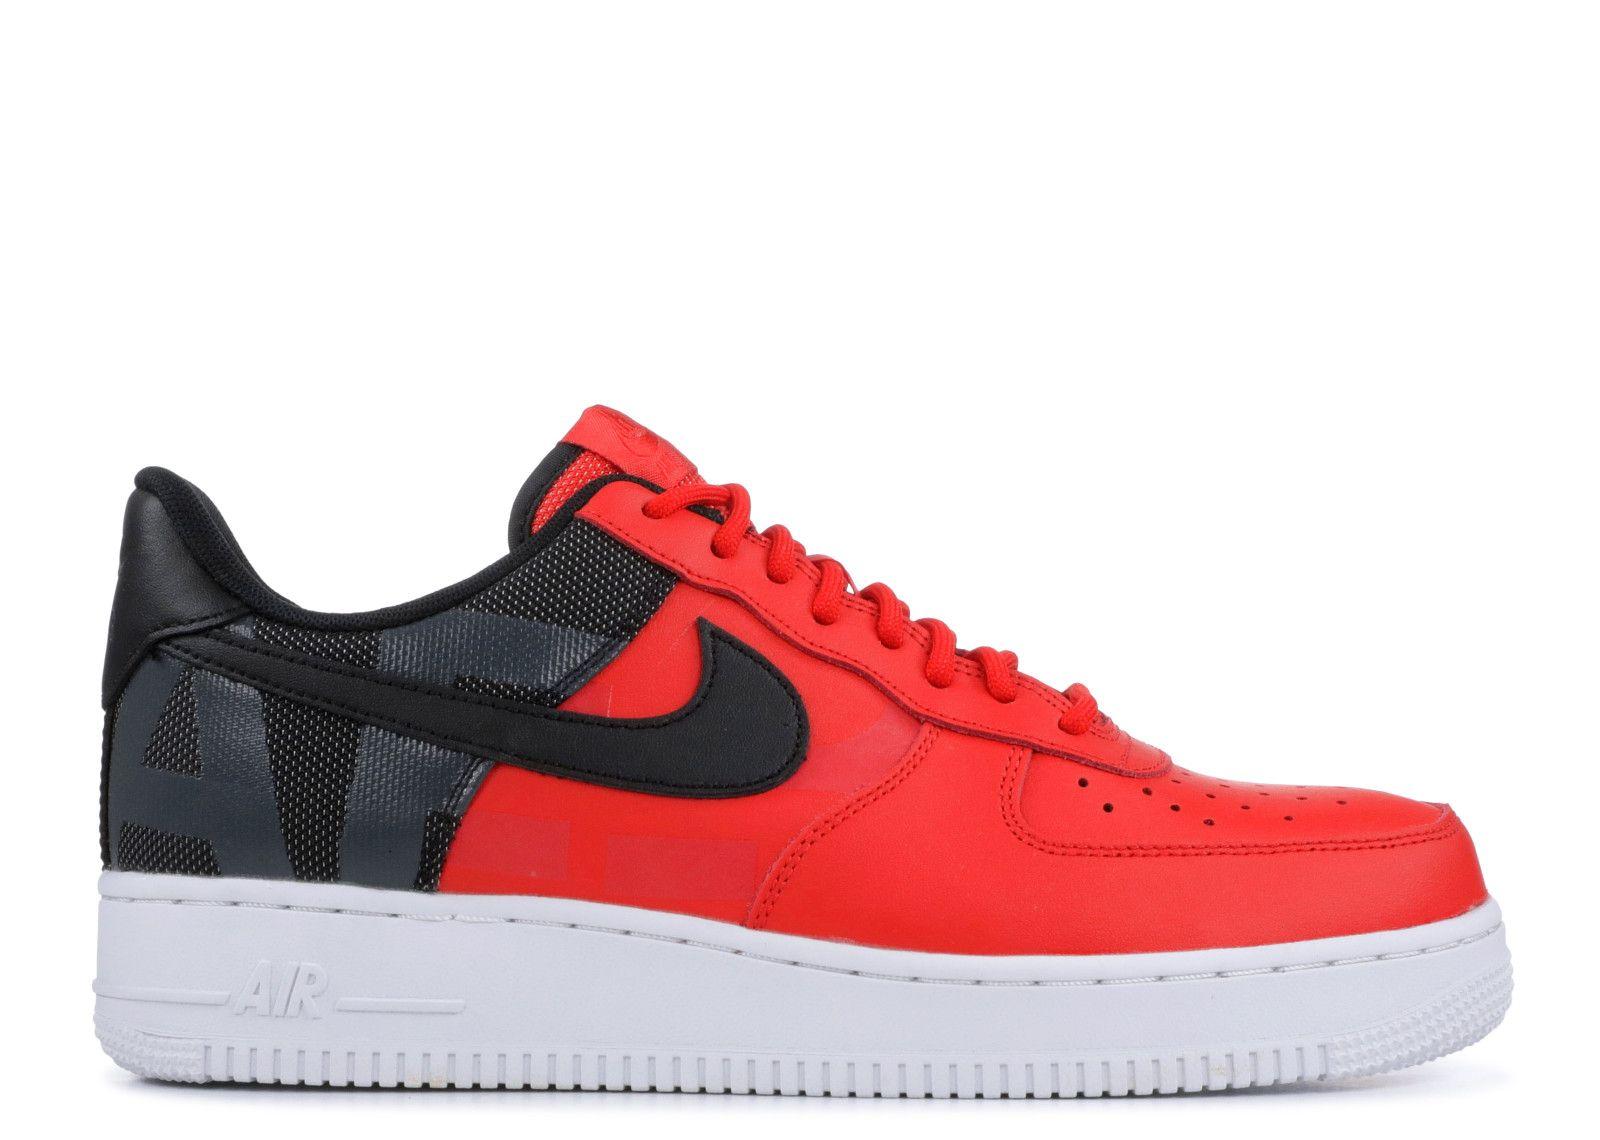 Nike Air Force 1 Low '07 Nike av8363 600 habanero